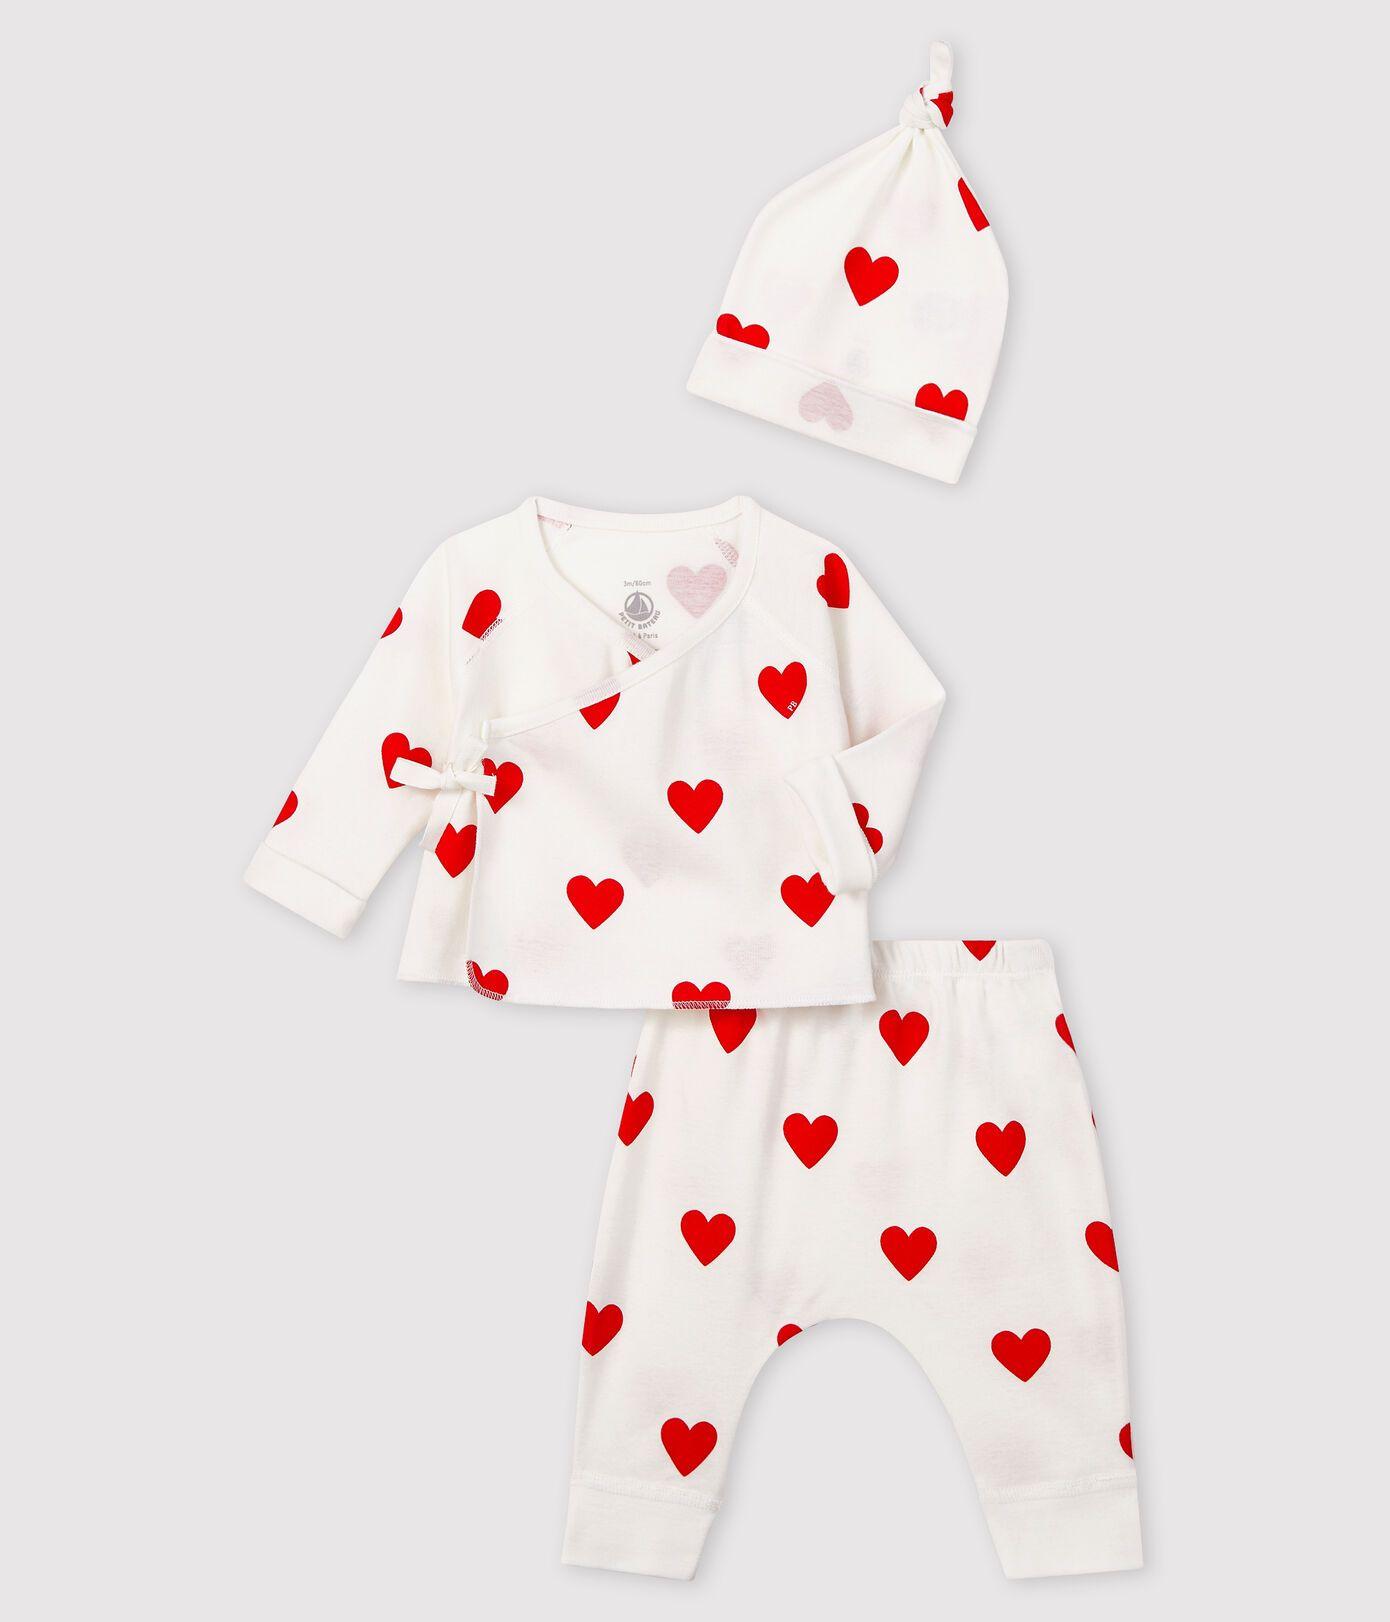 56361 LAMBEL 00 WHITE RED WHITE PETIT BATEAU GIFT SETS